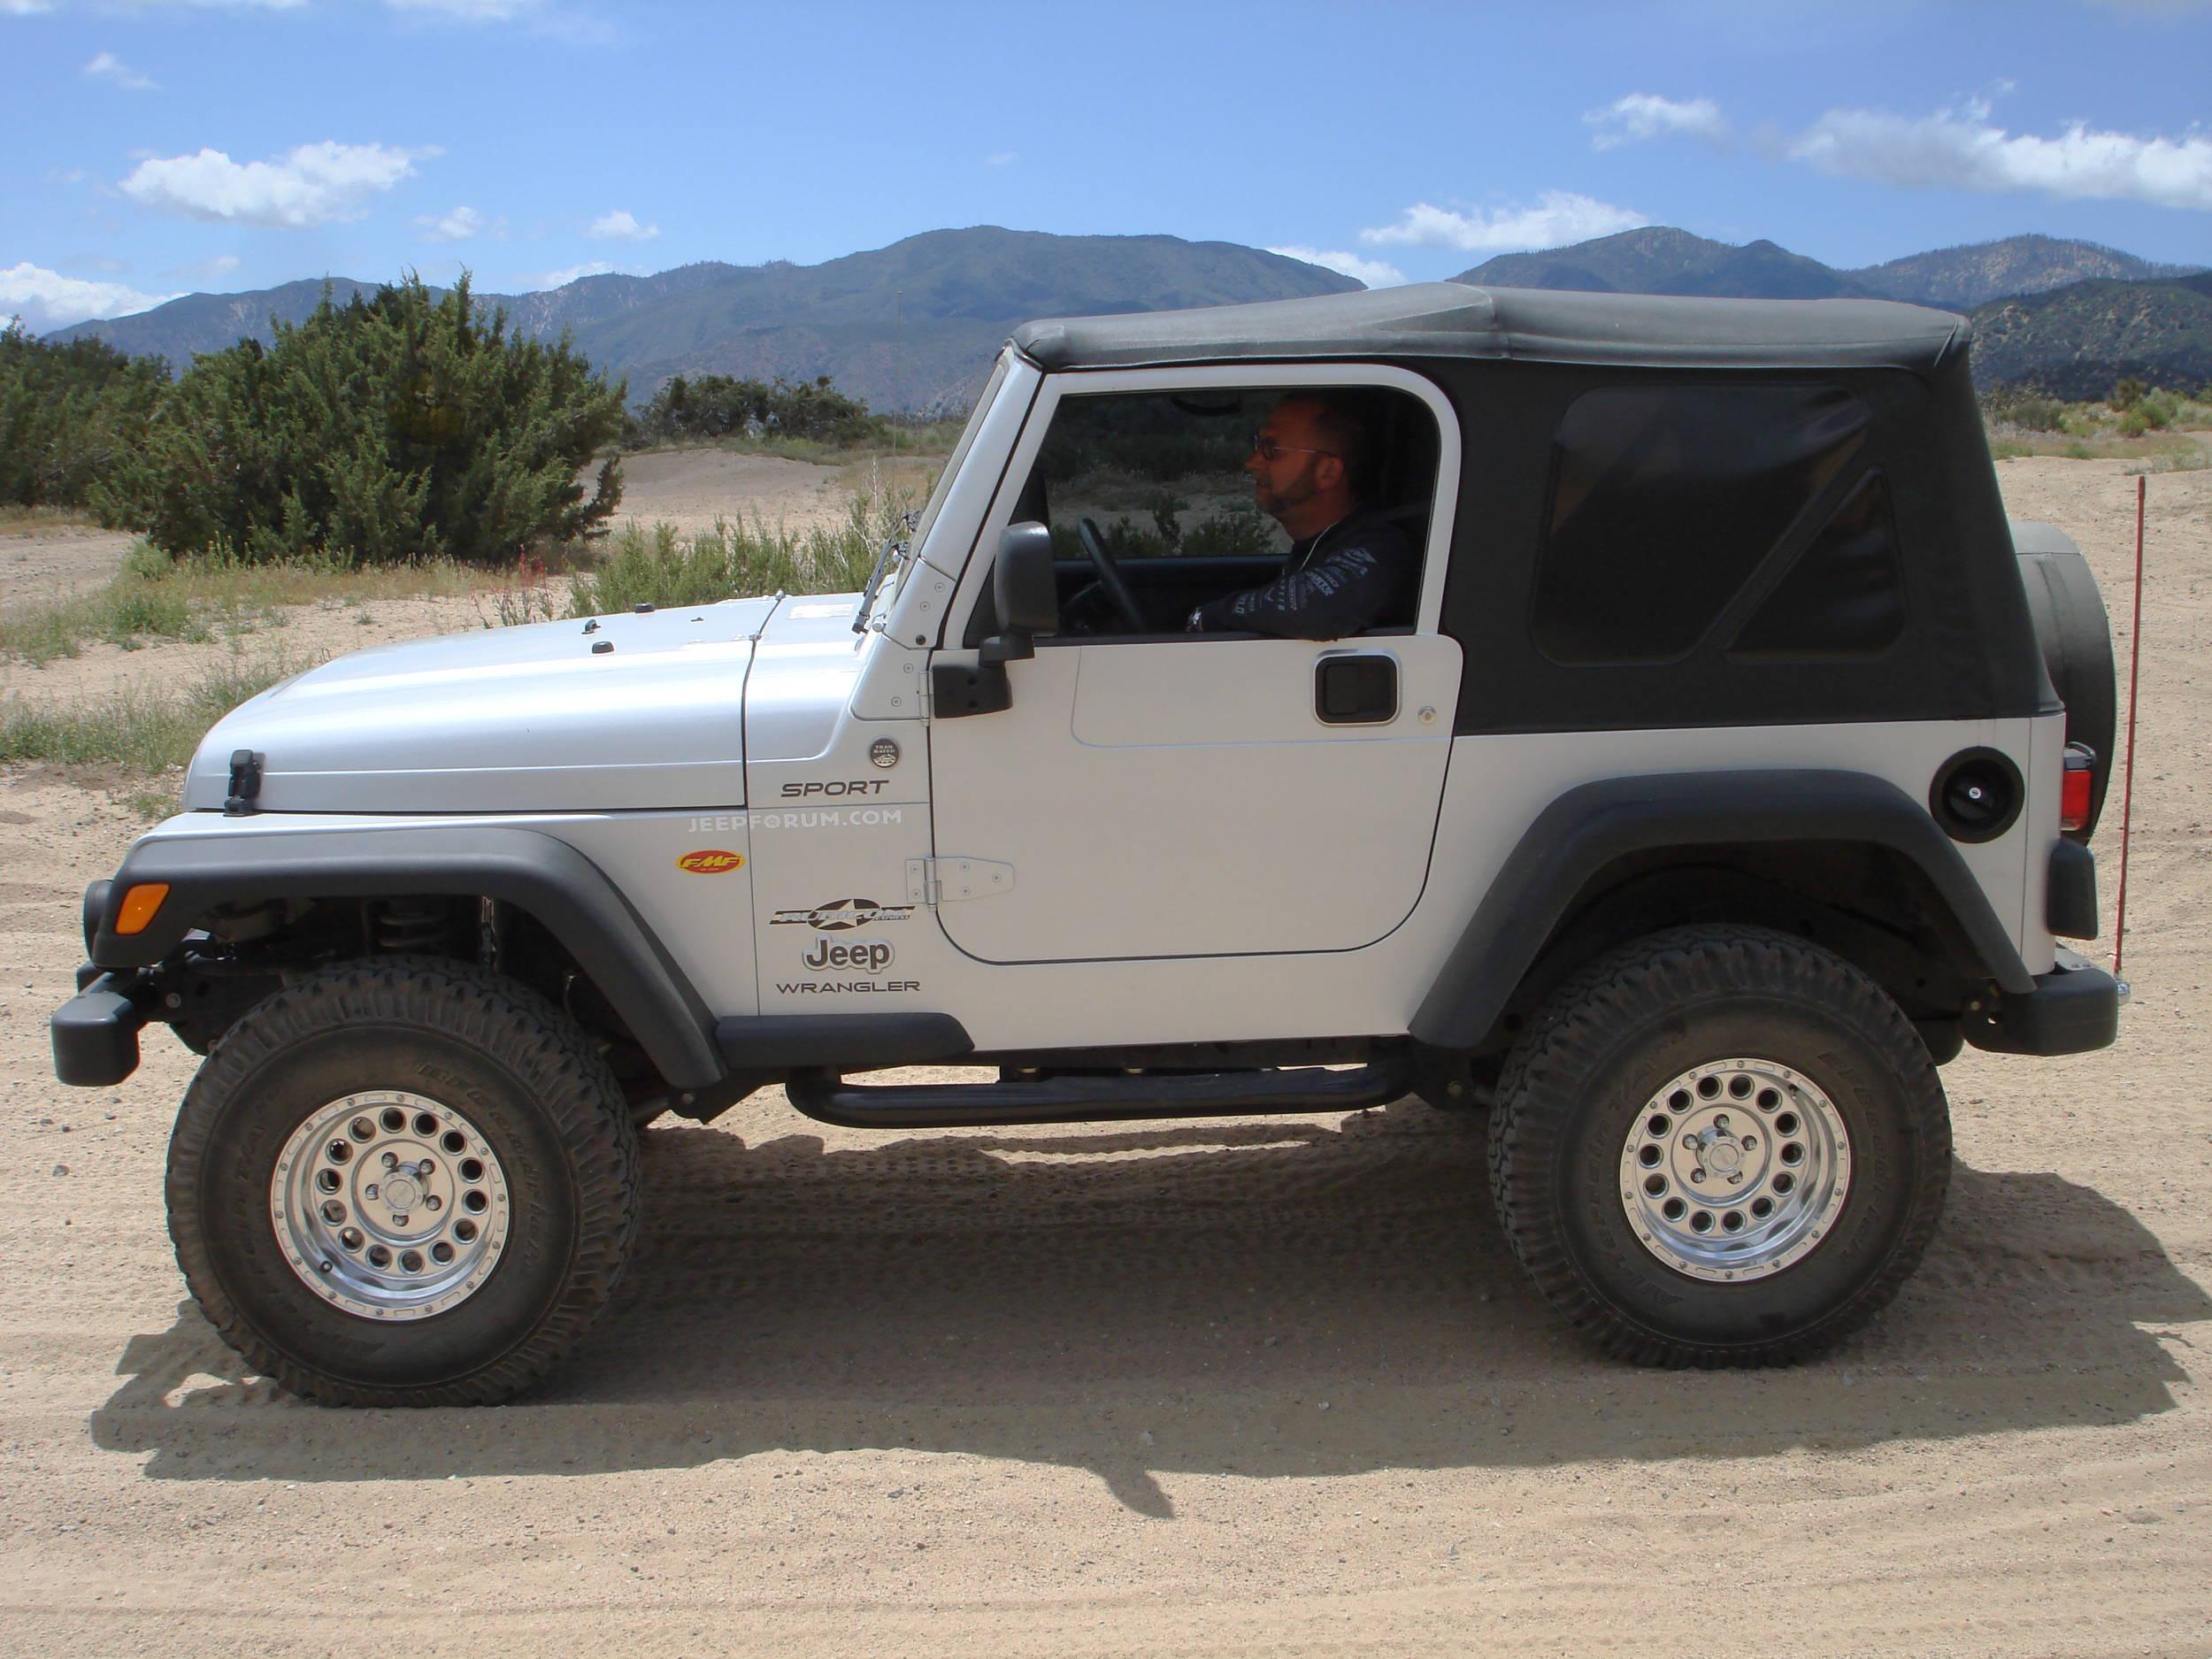 Rich_in_jeep002.JPG